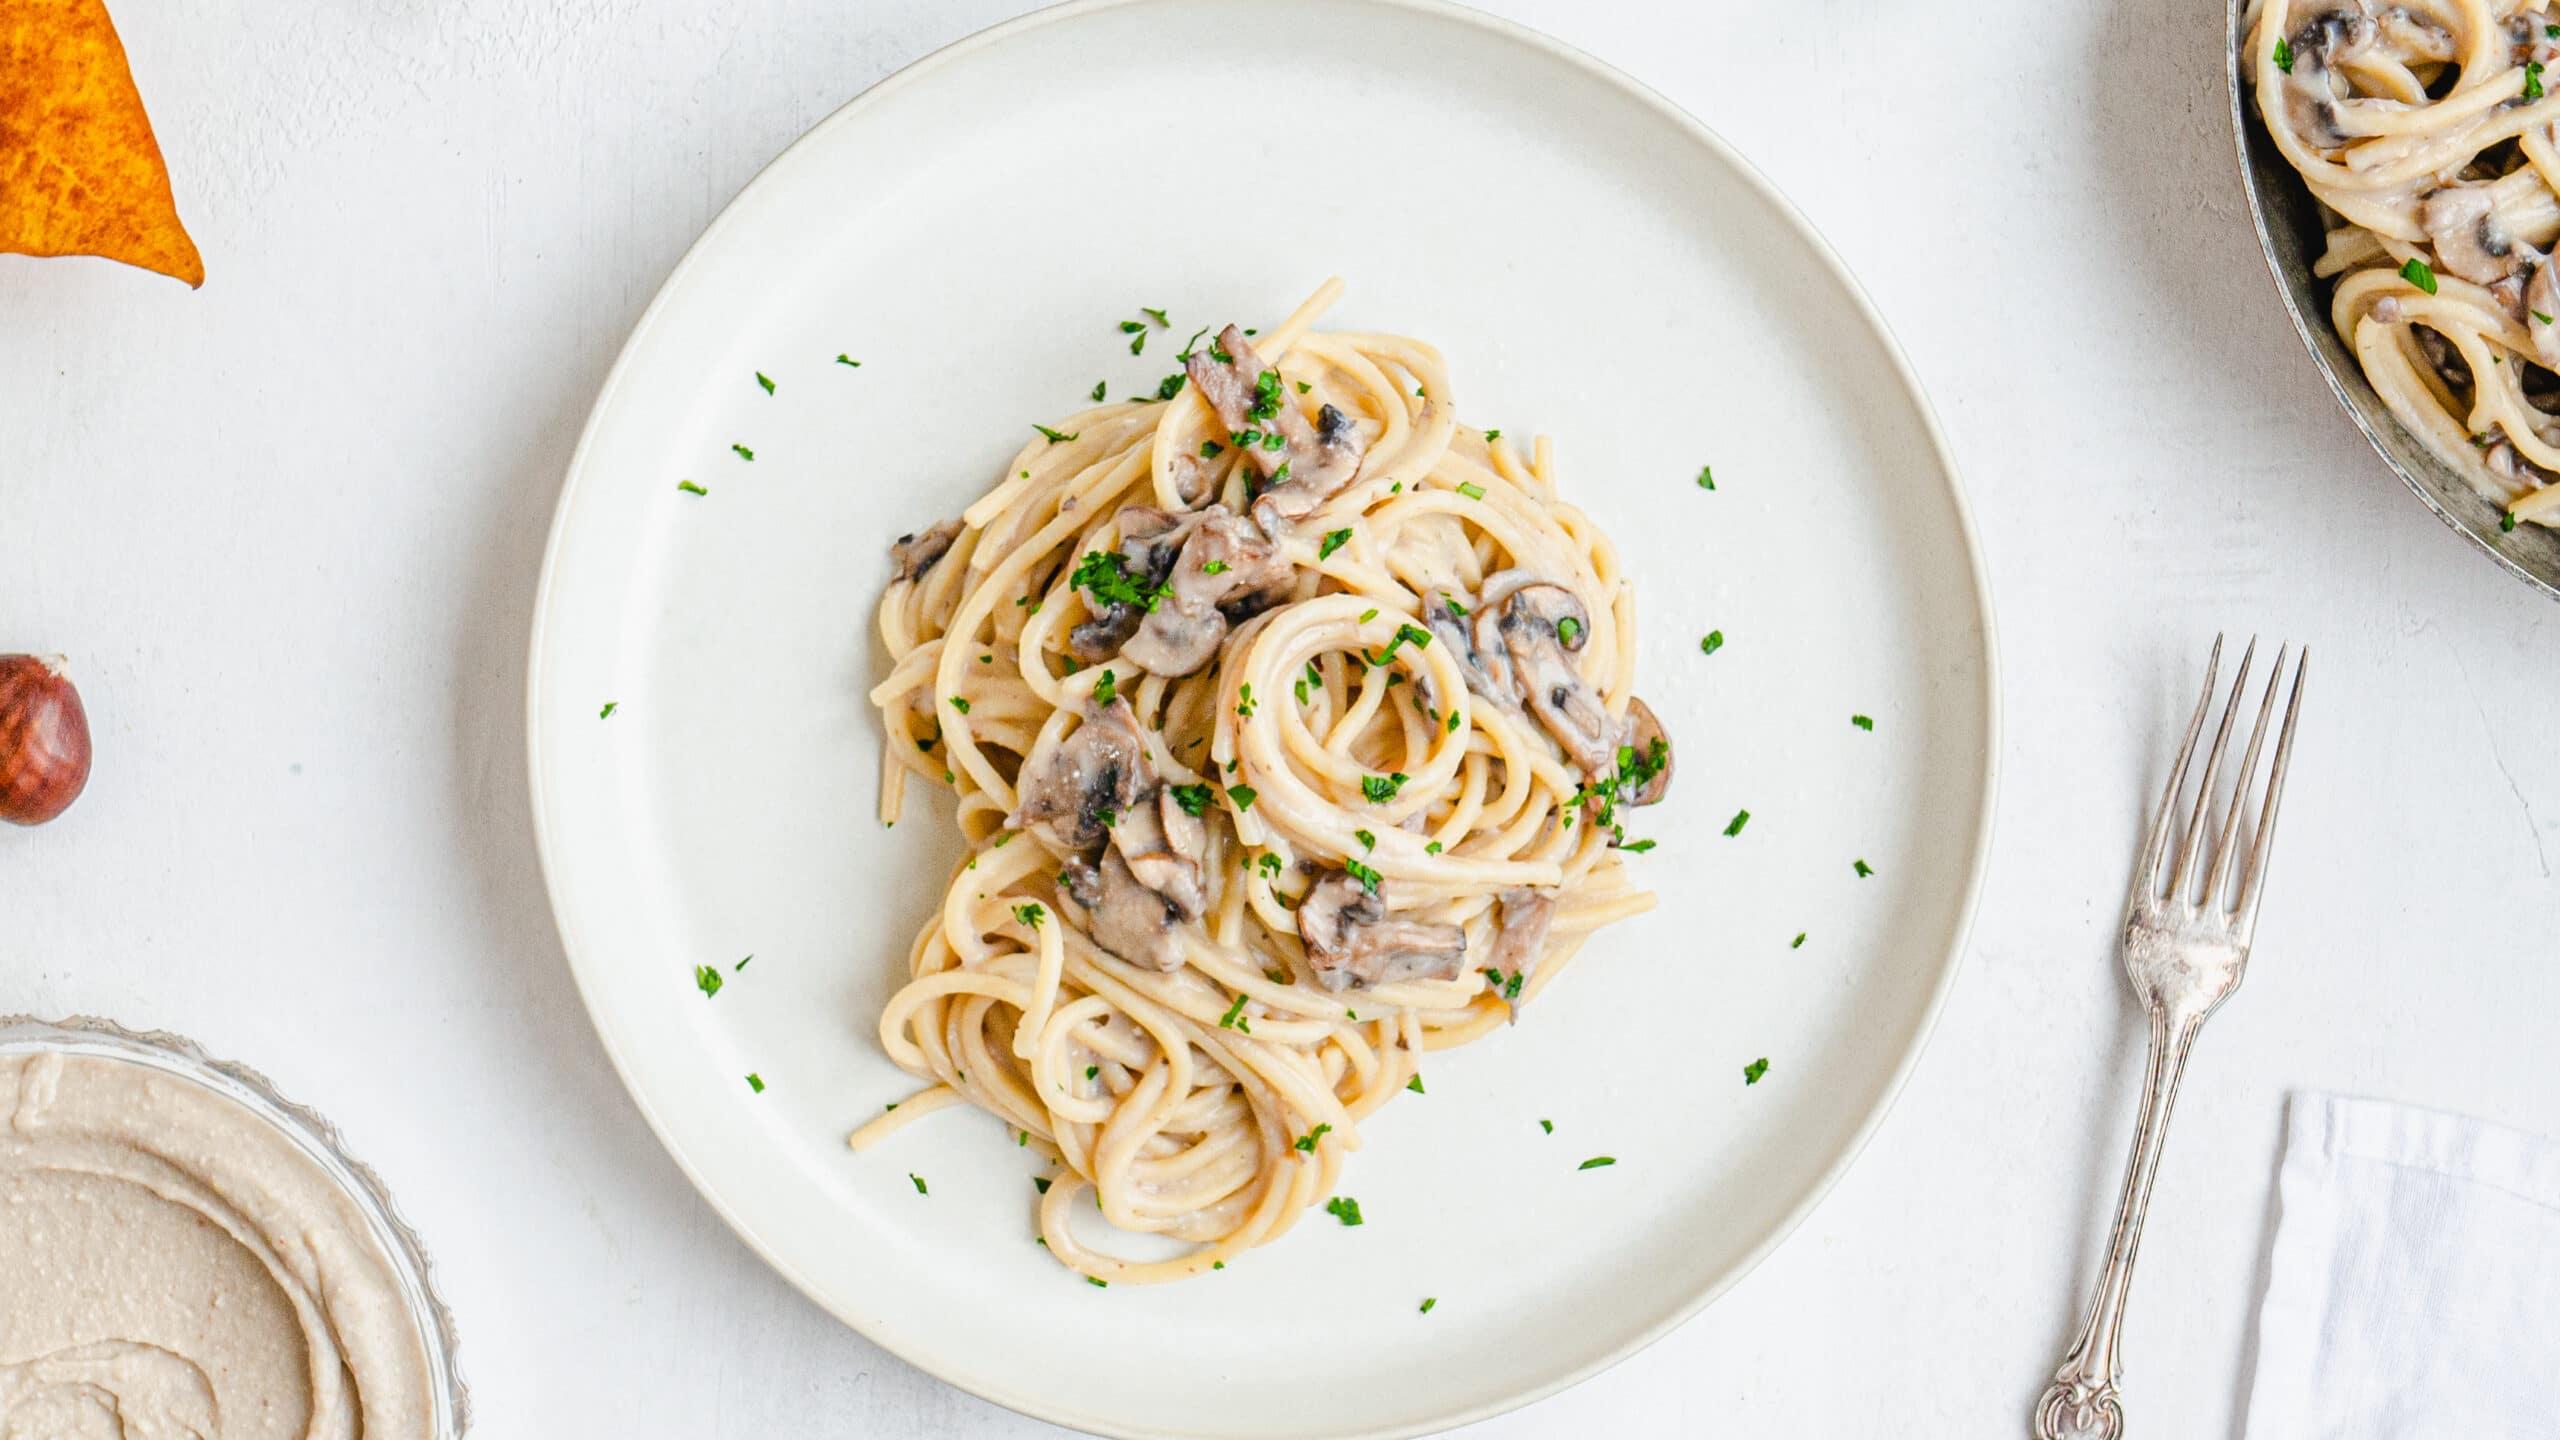 spaghetti with chestnut pesto and mushrooms